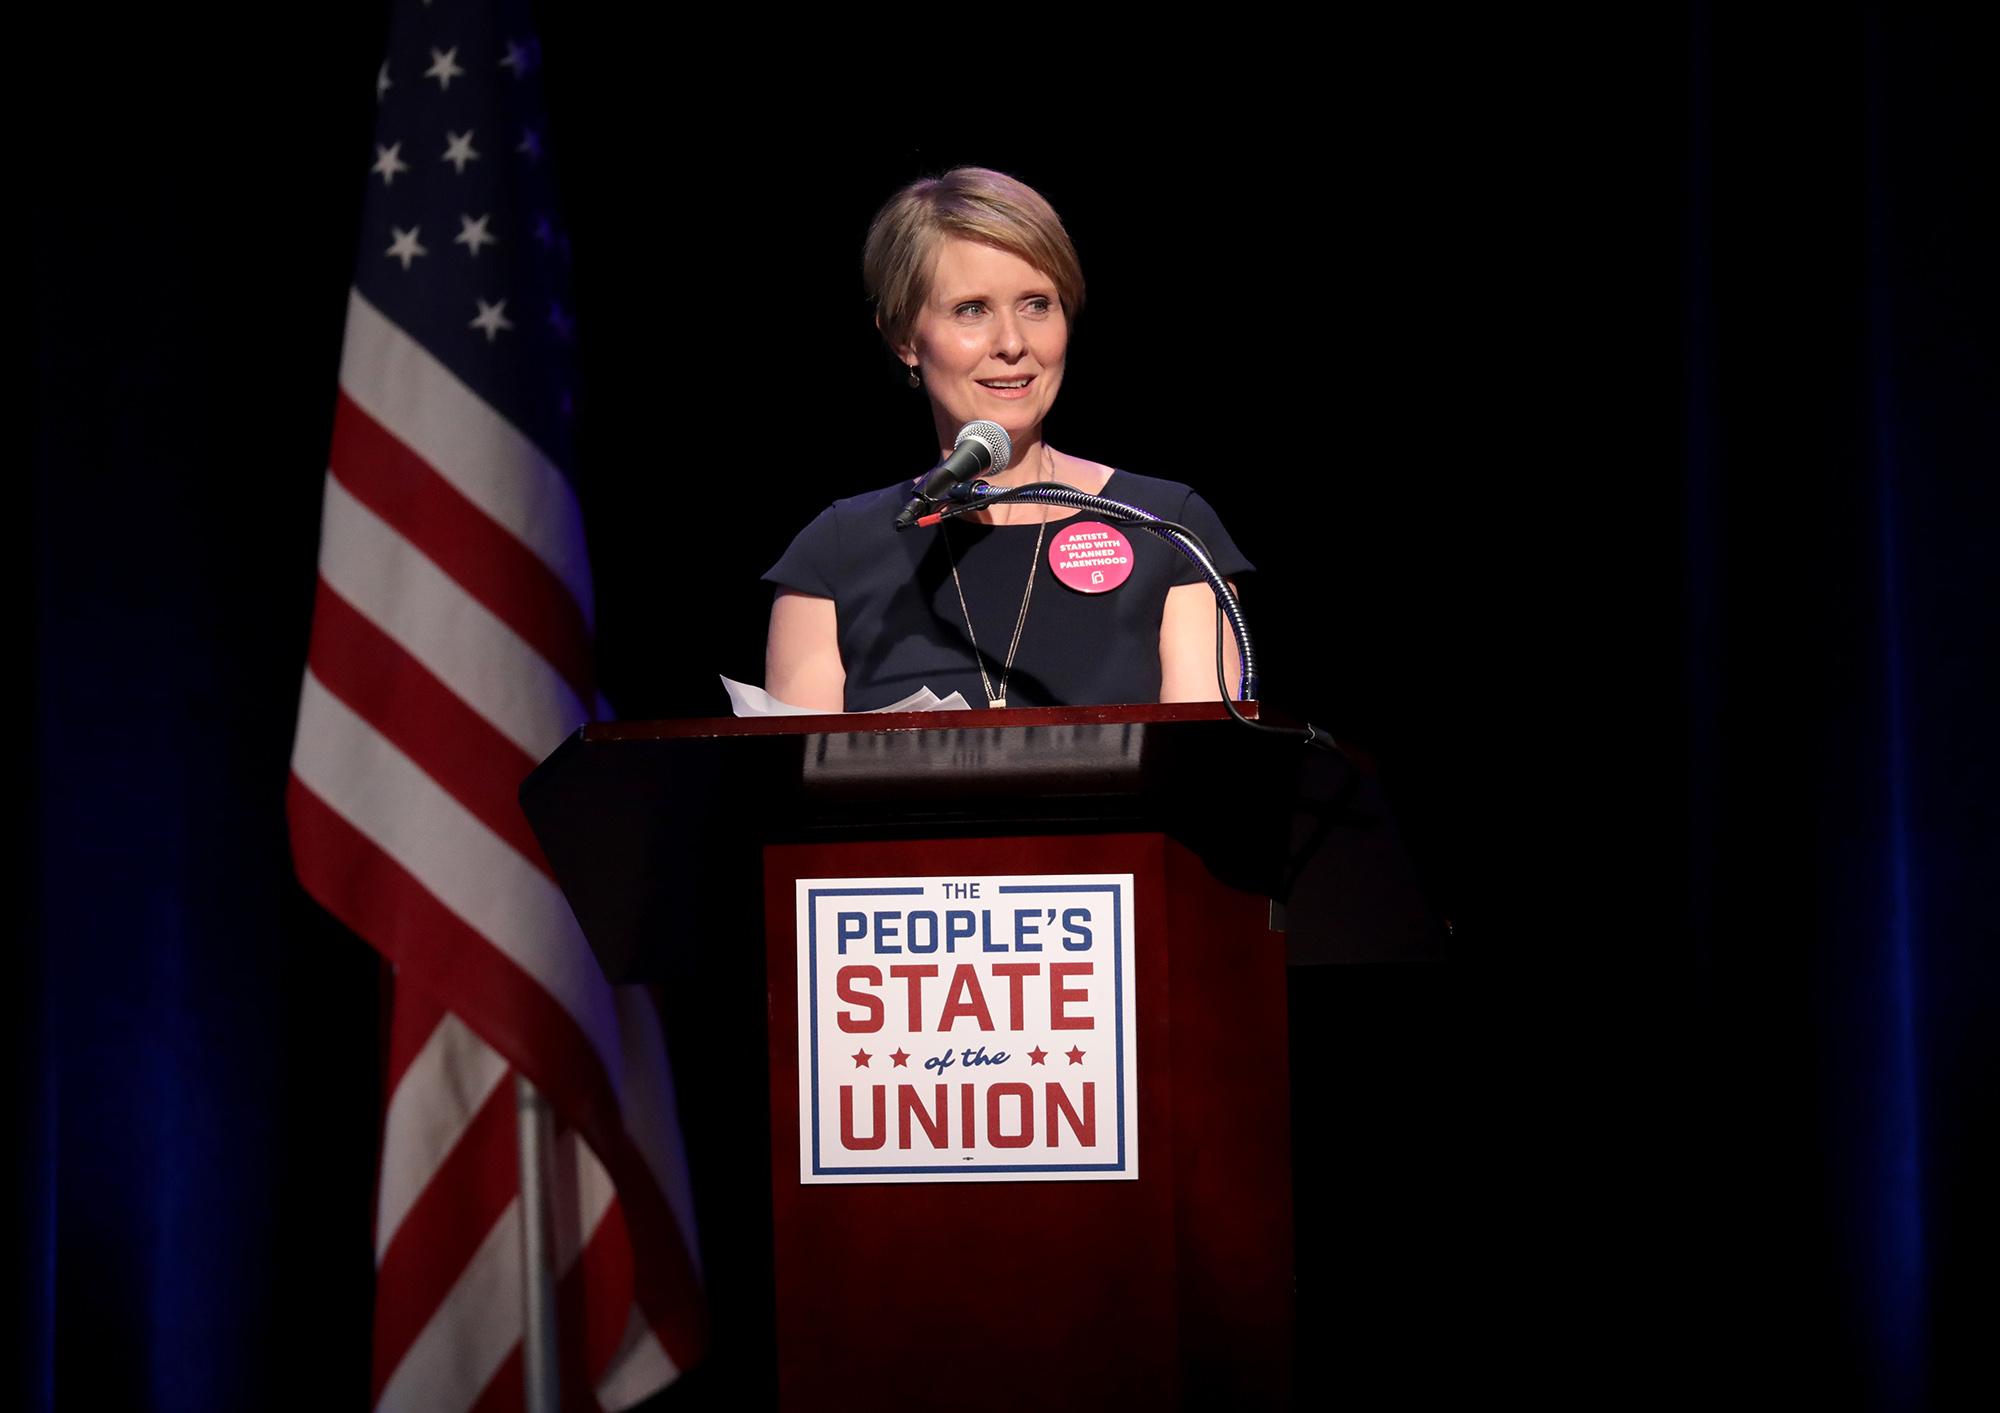 Gubernatorial hopeful Cynthia Nixon